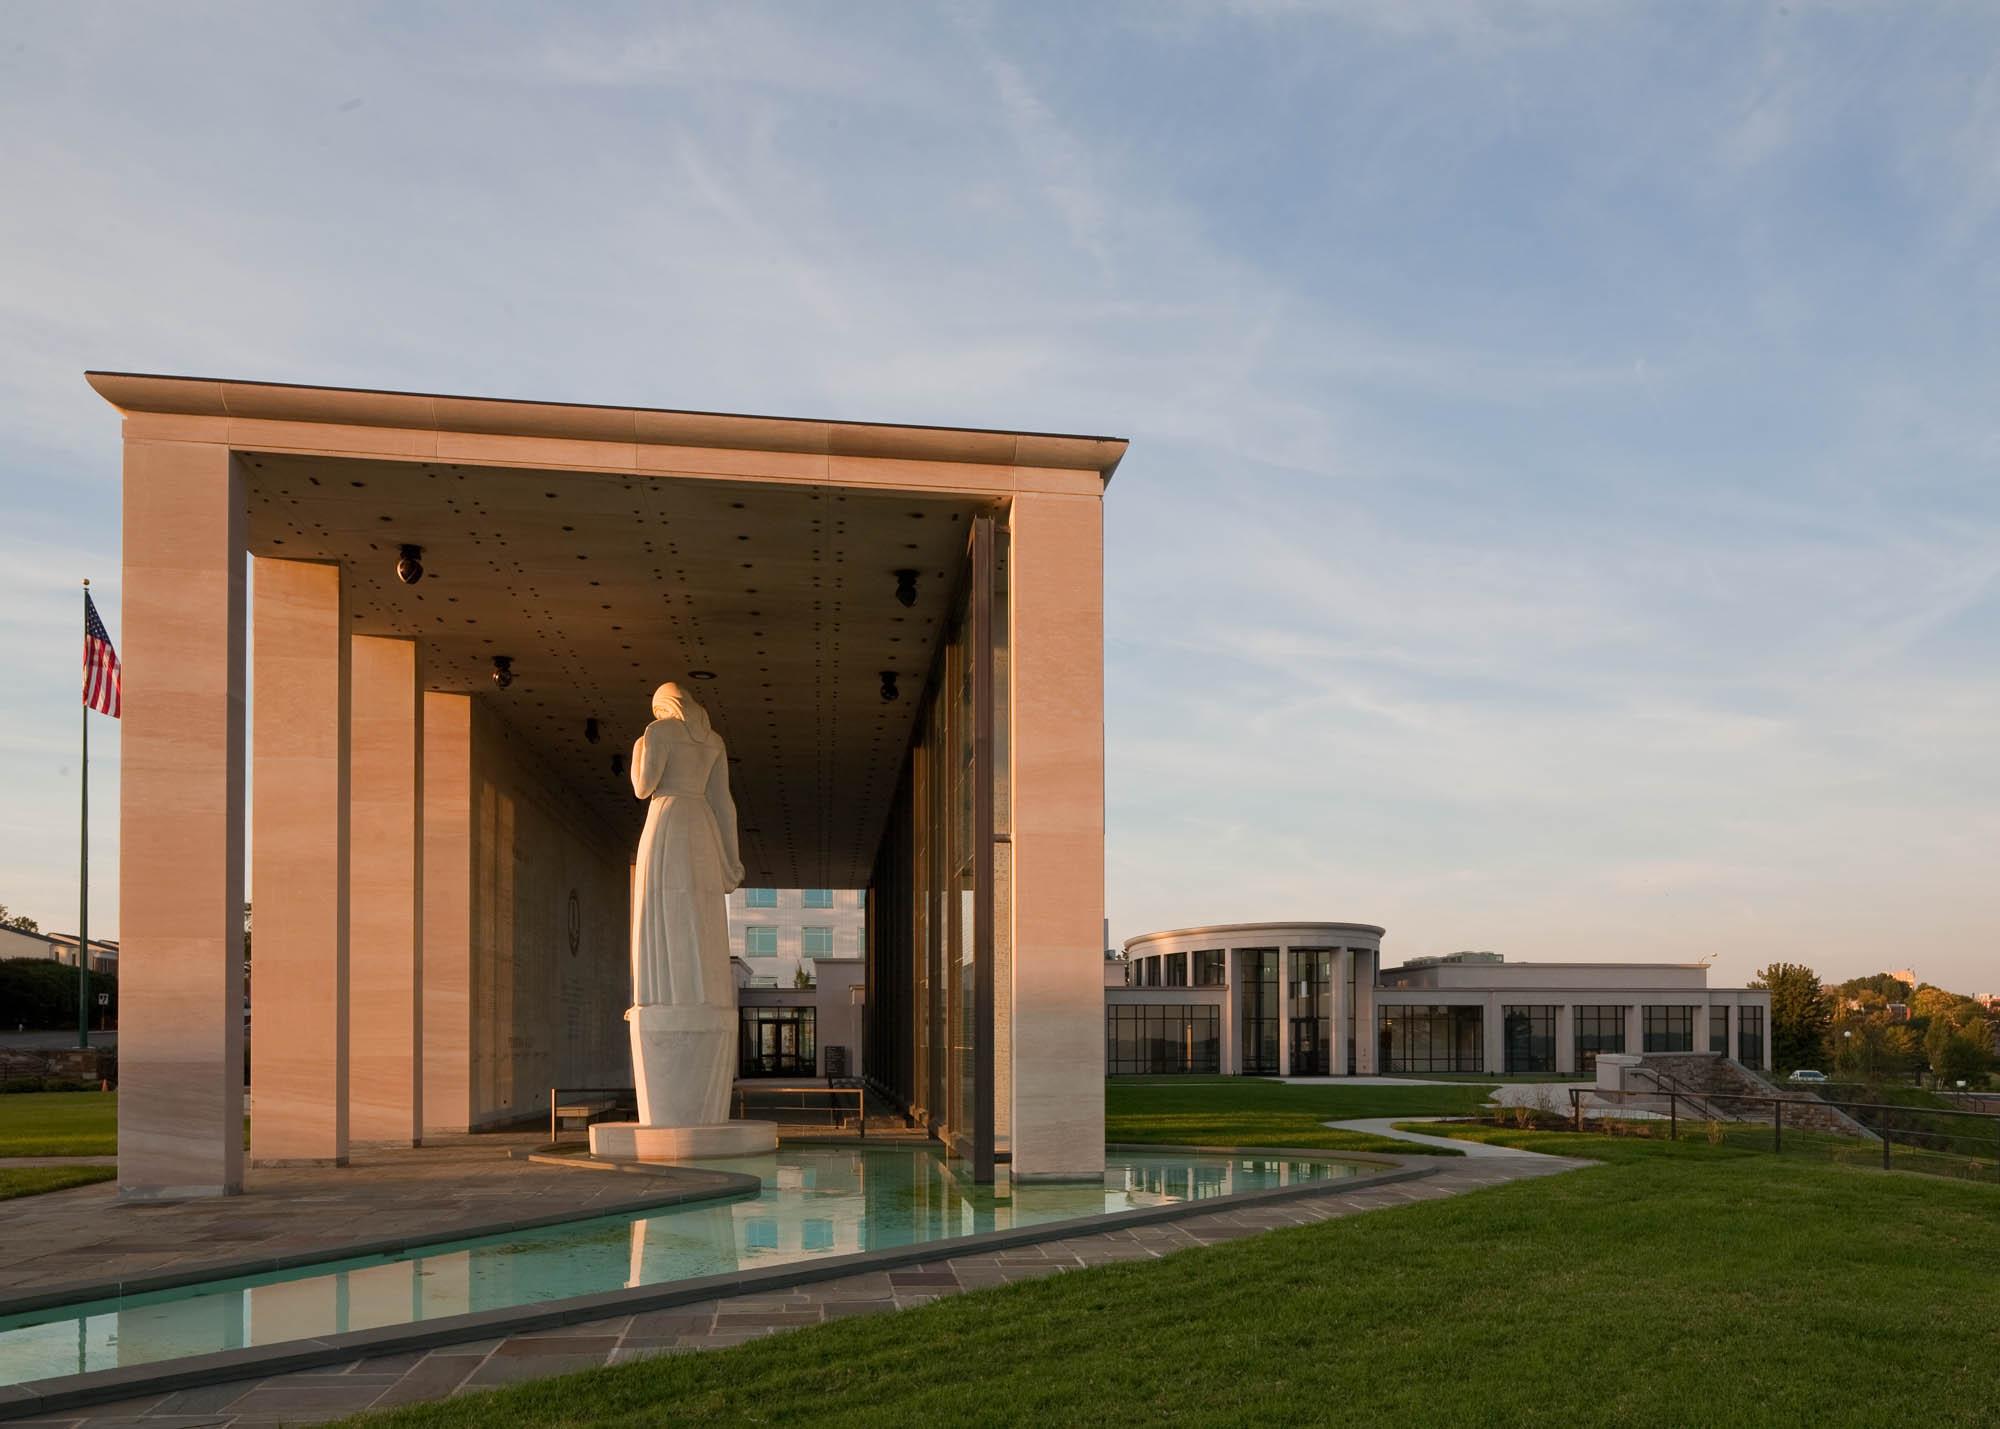 Glav Holmes Architecture